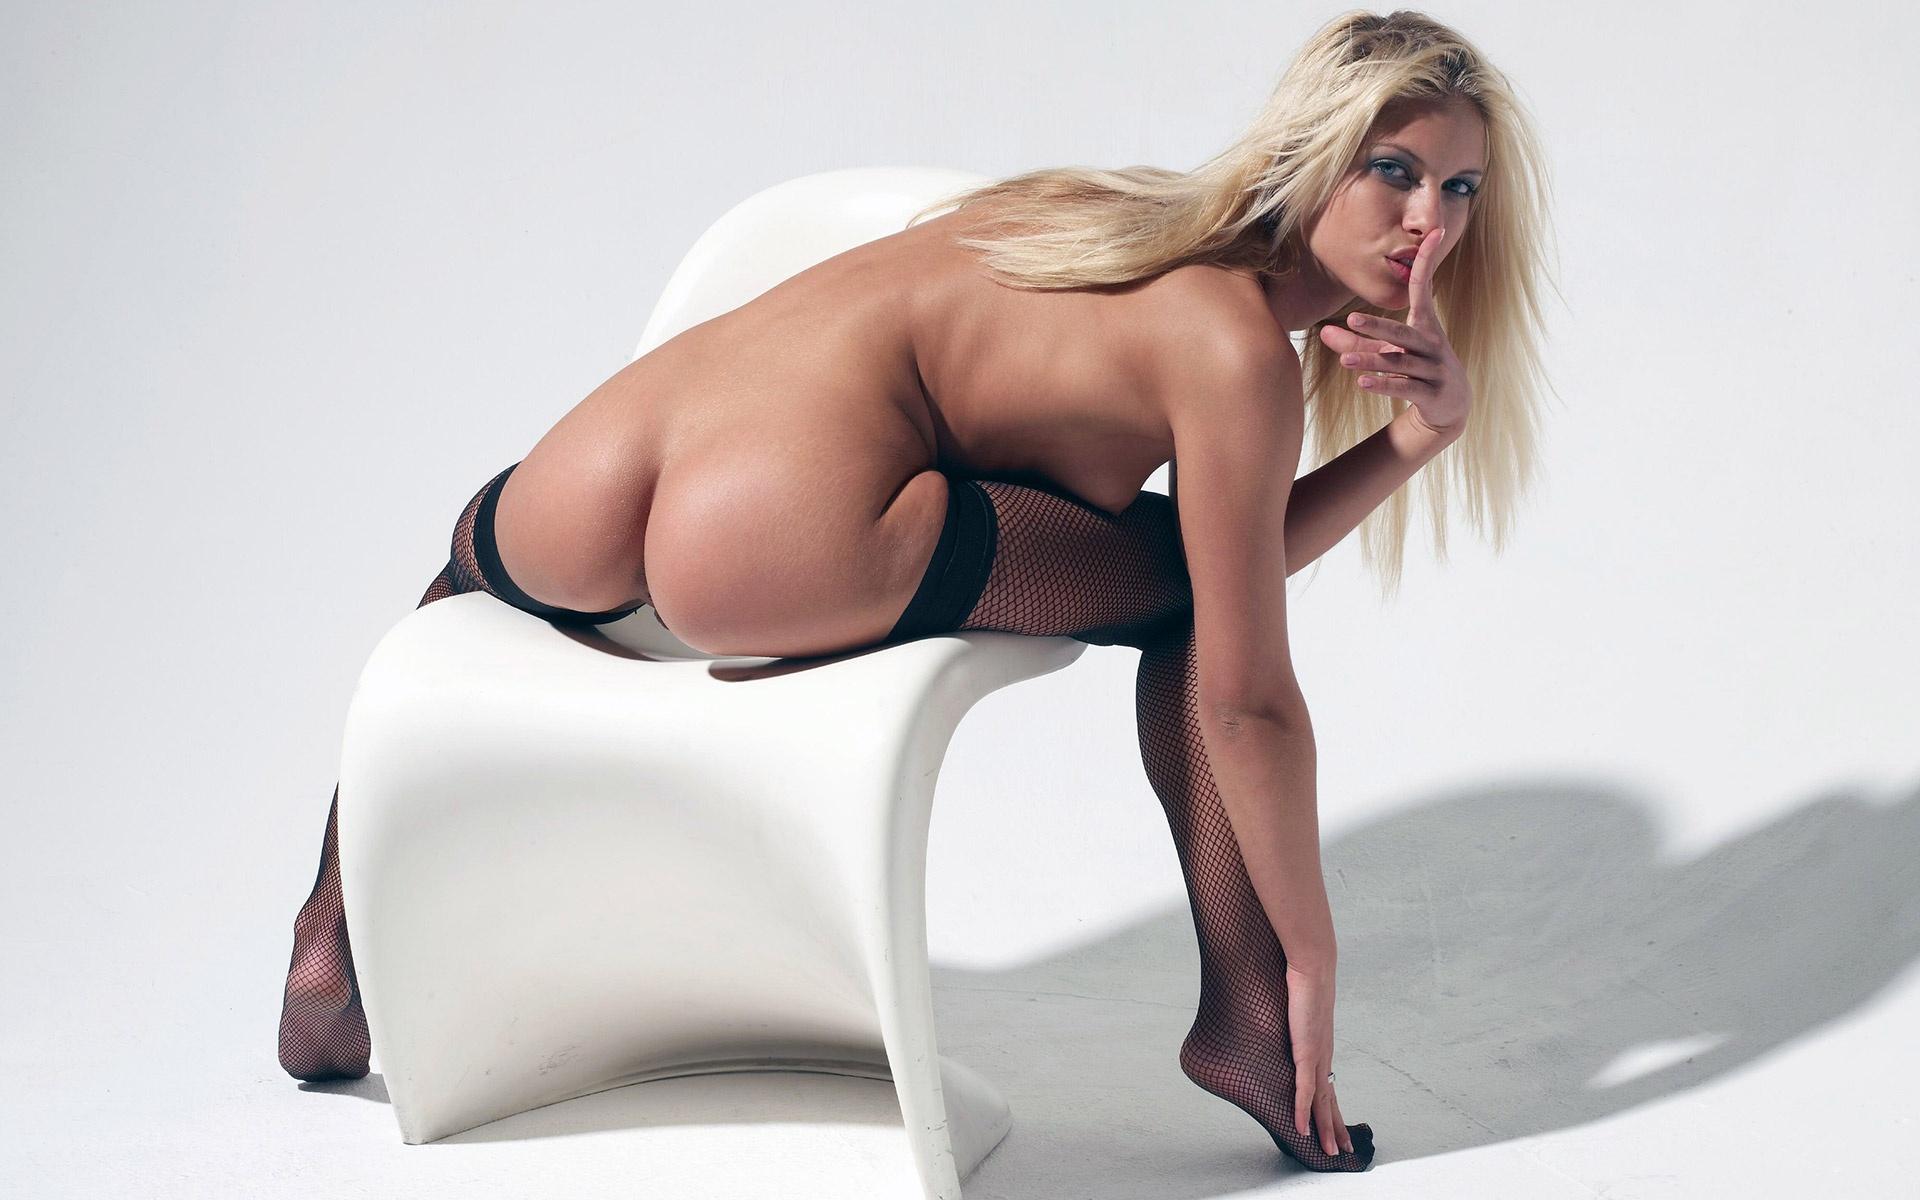 Big tit swedes video clips